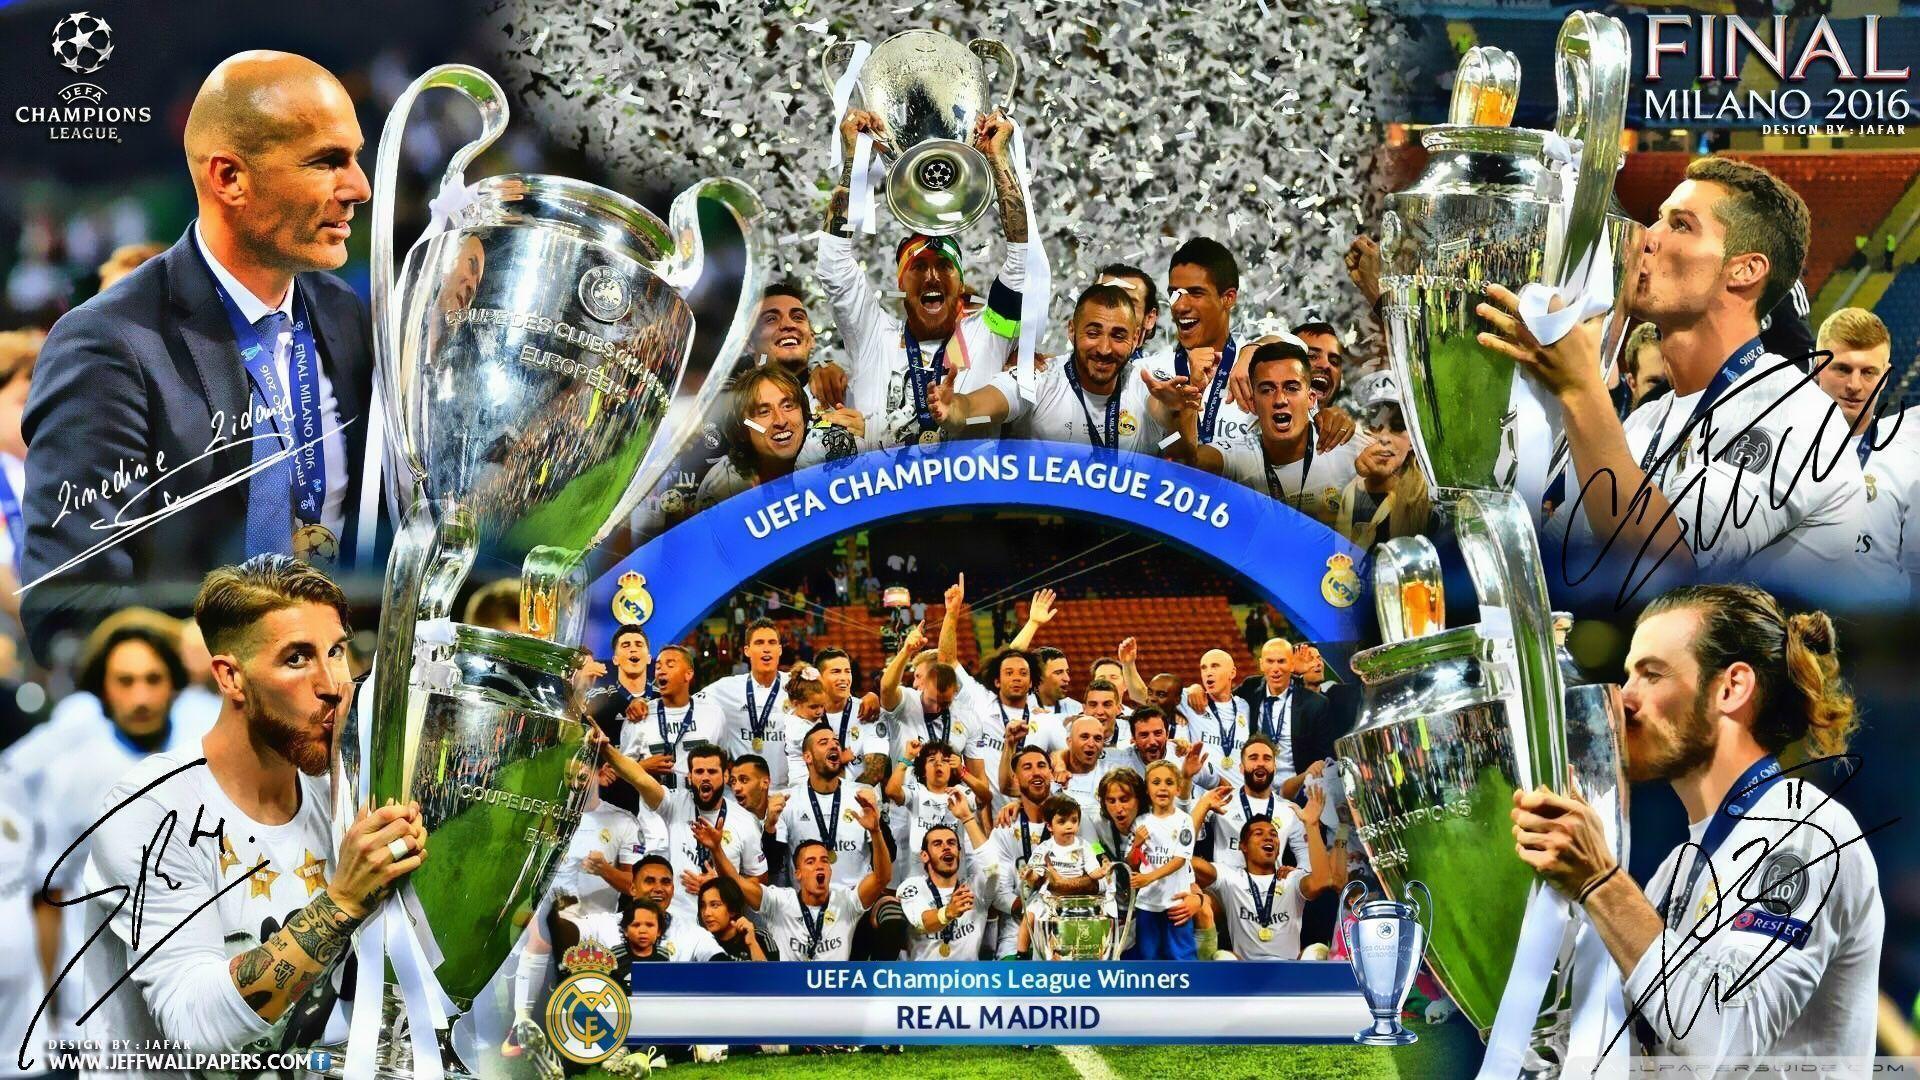 Real Madrid Wallpaper Equipo 2018 Hd Football In 2020 Real Madrid Wallpapers Real Madrid Champions League Madrid Wallpaper